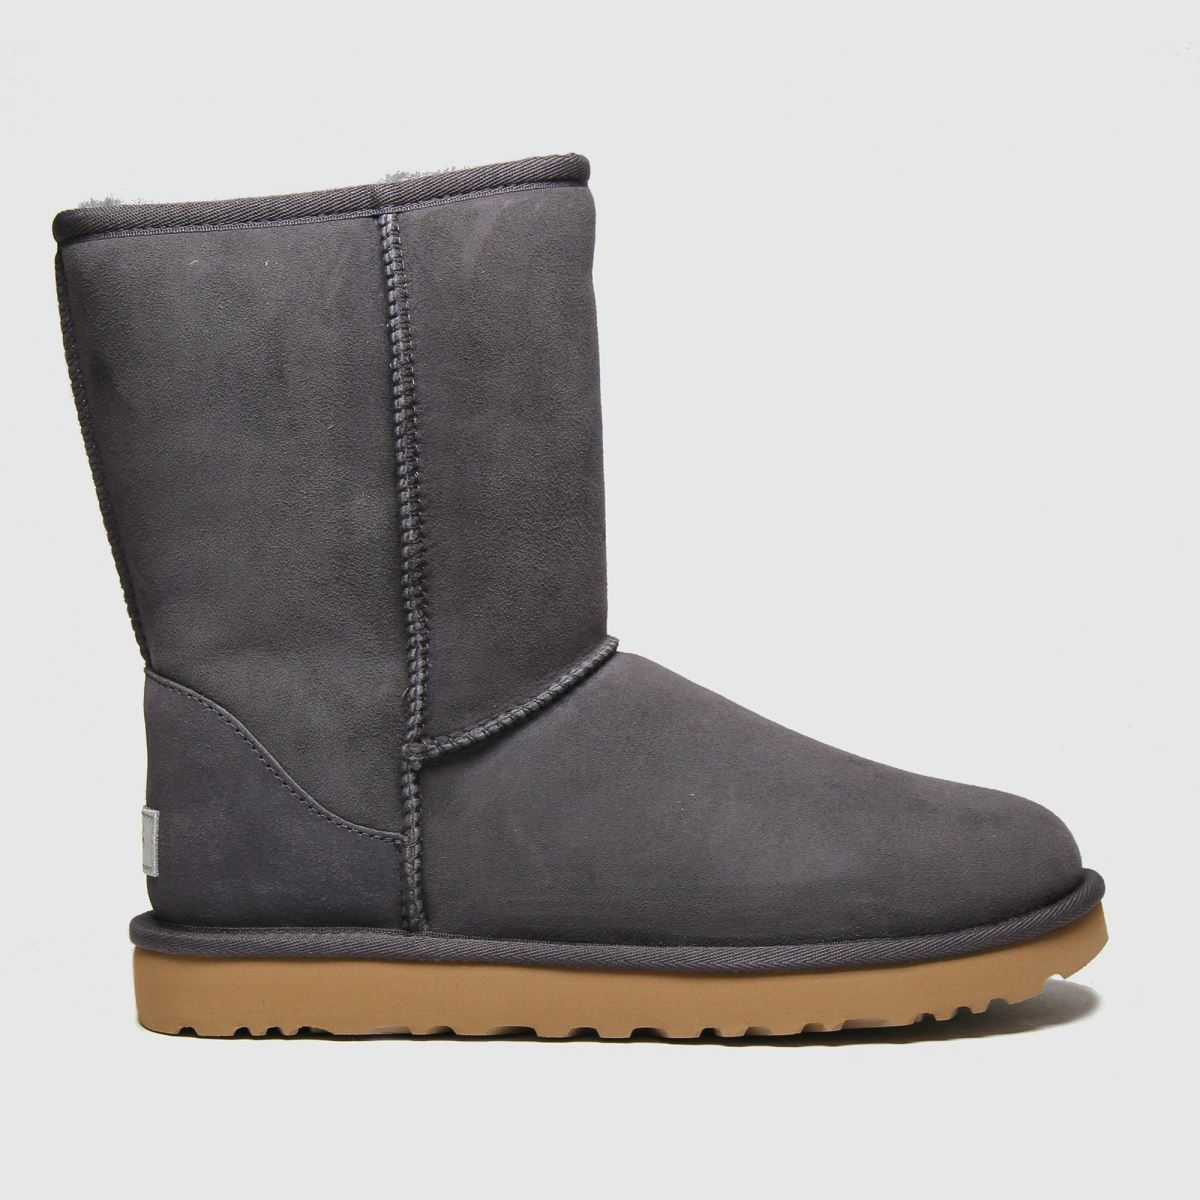 UGG Dark Grey Classic Short Ii Boots